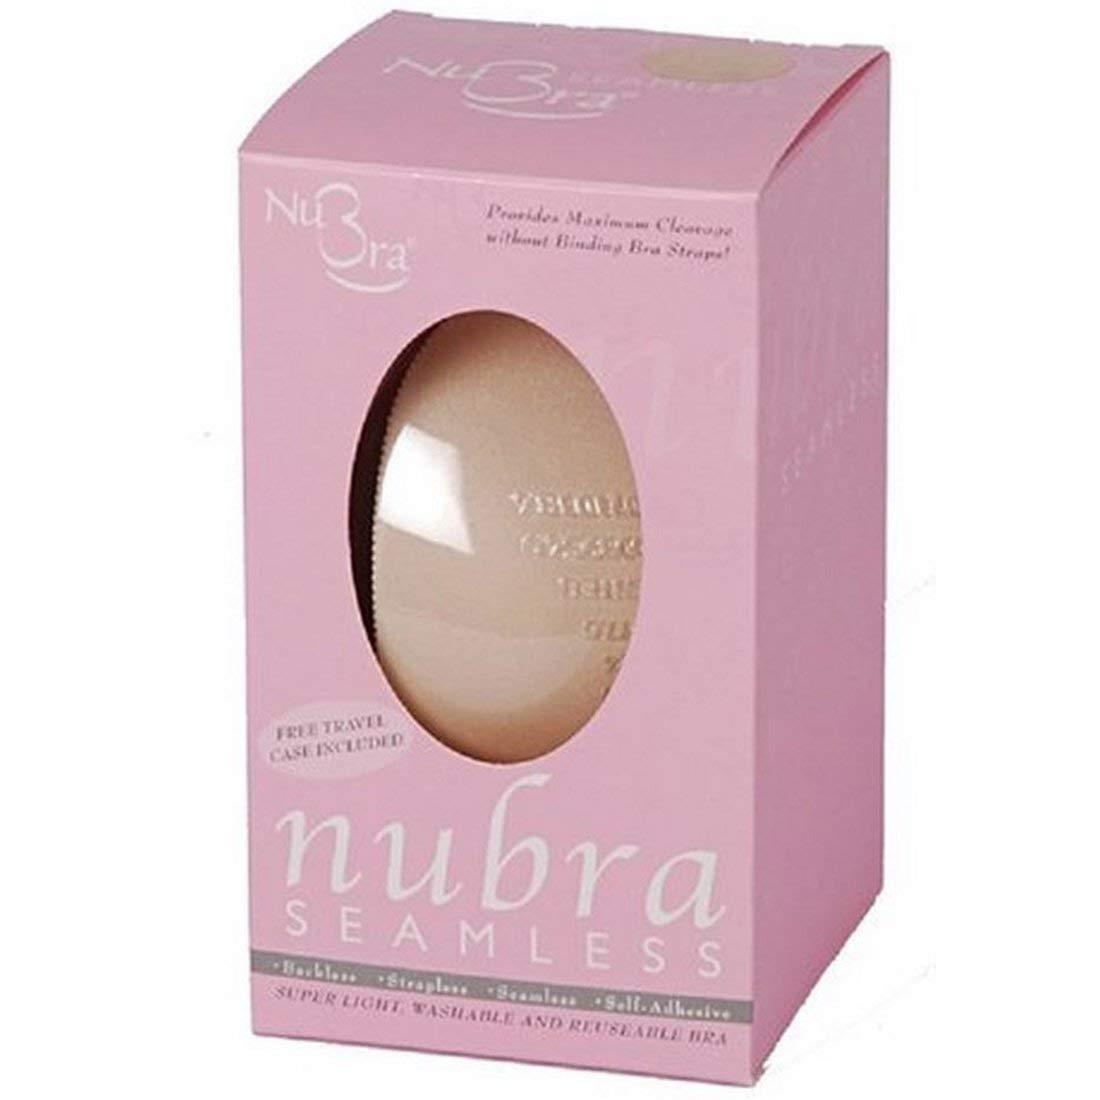 b2ce2d2774 Buy Nubra Seamless Super Light Adhesive Bra